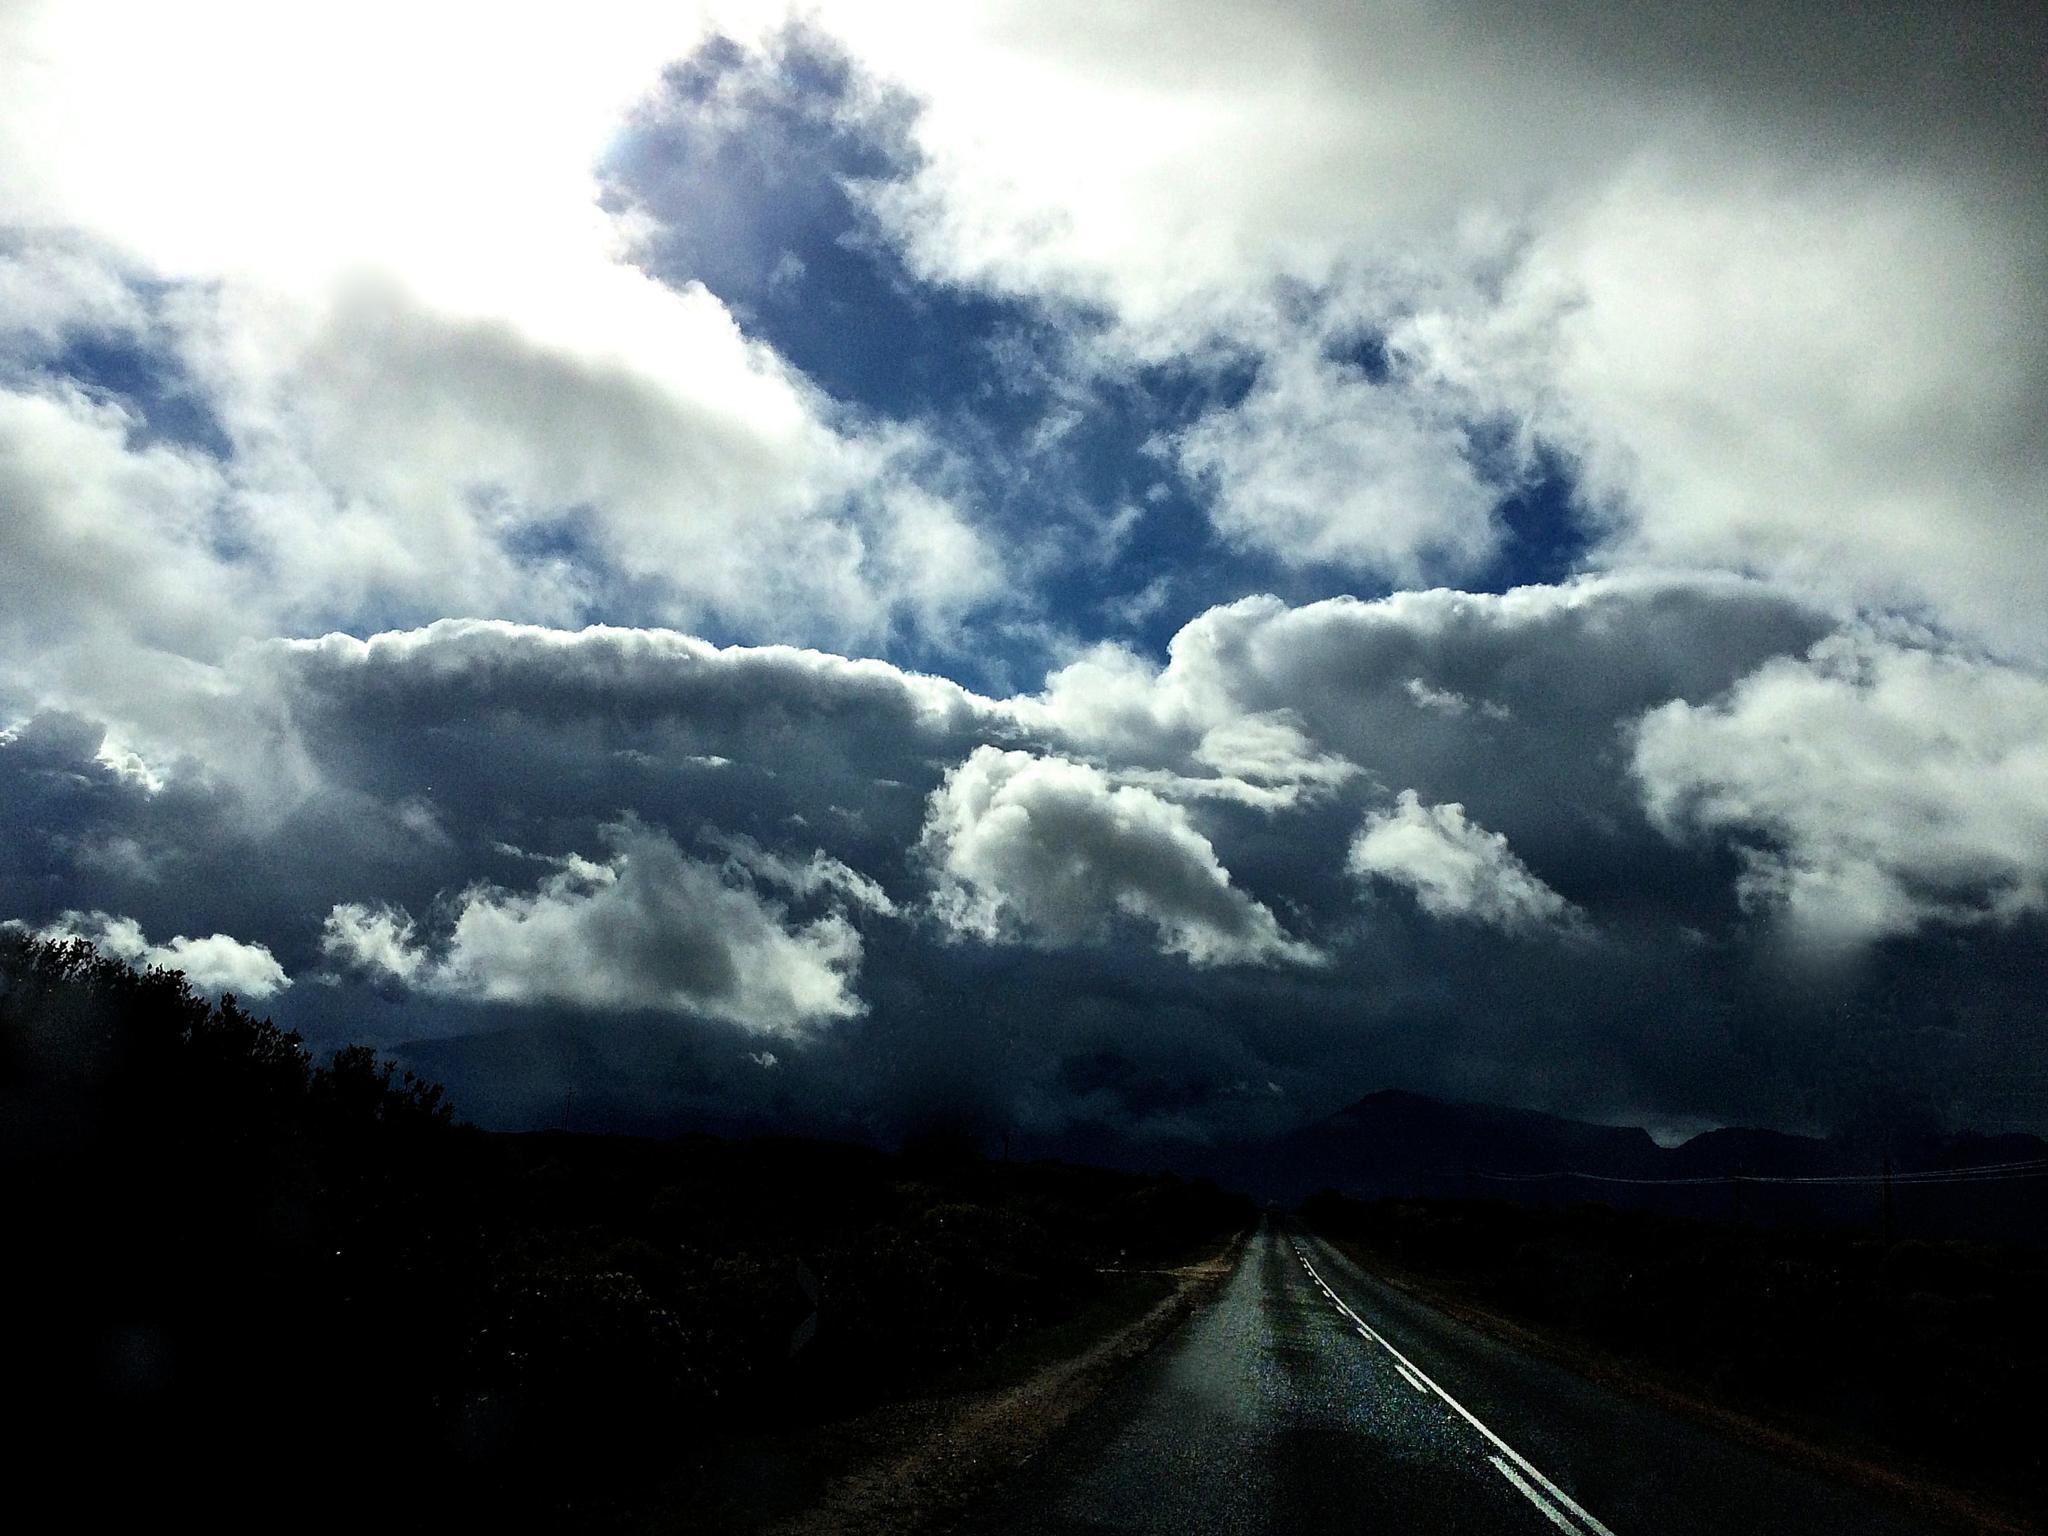 The Road to Stanford by Martha van der Westhuizen